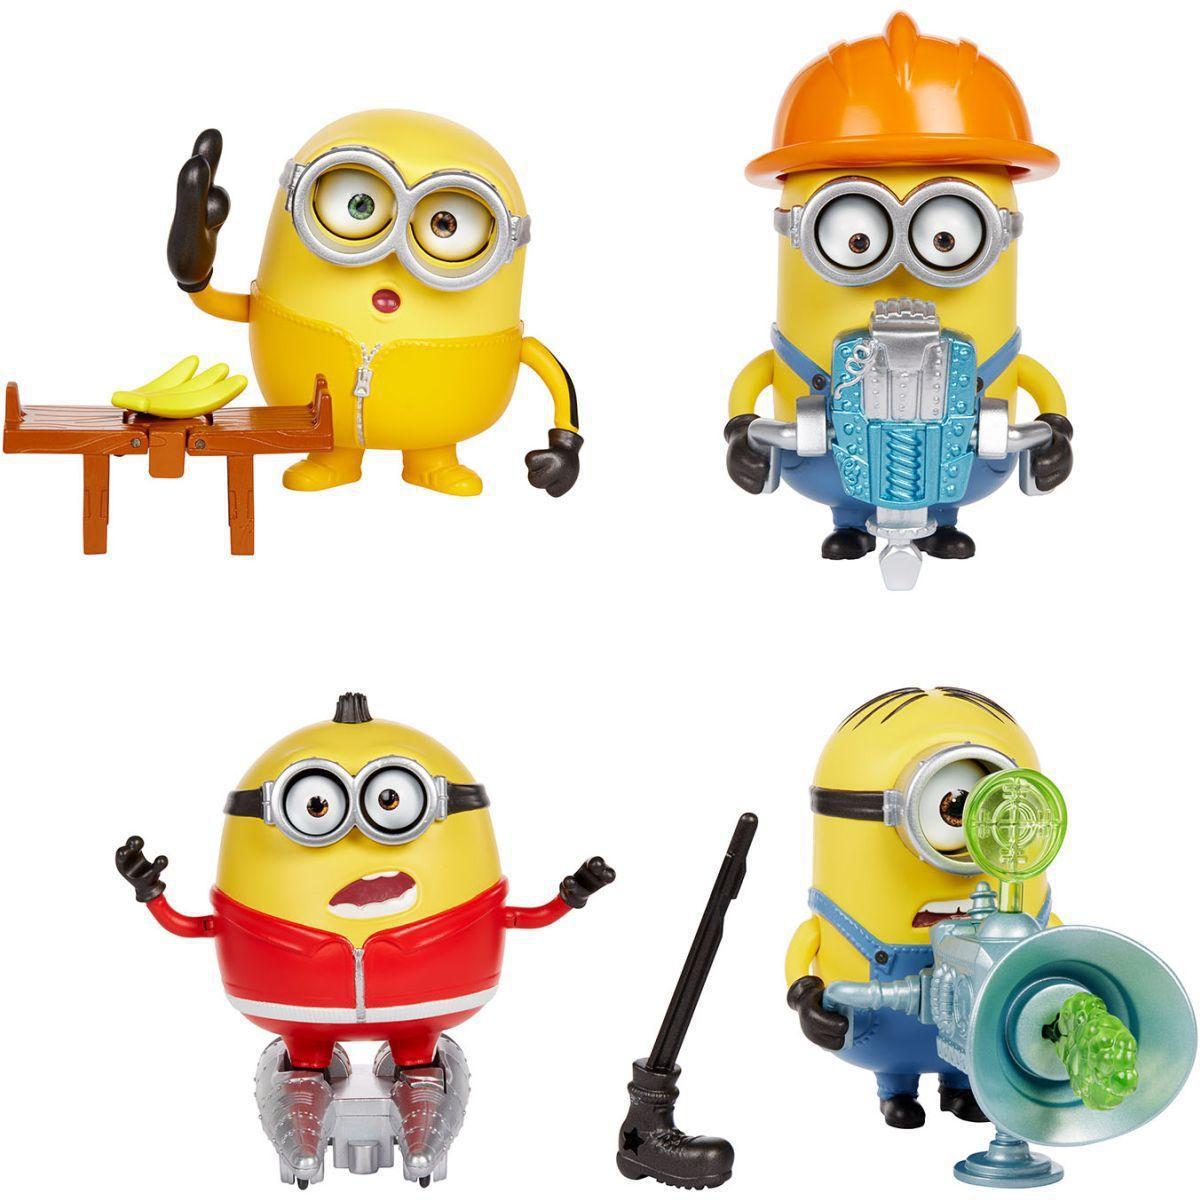 Boneco Bob: Minions (Barulhento e Bagunceiro) - Mattel